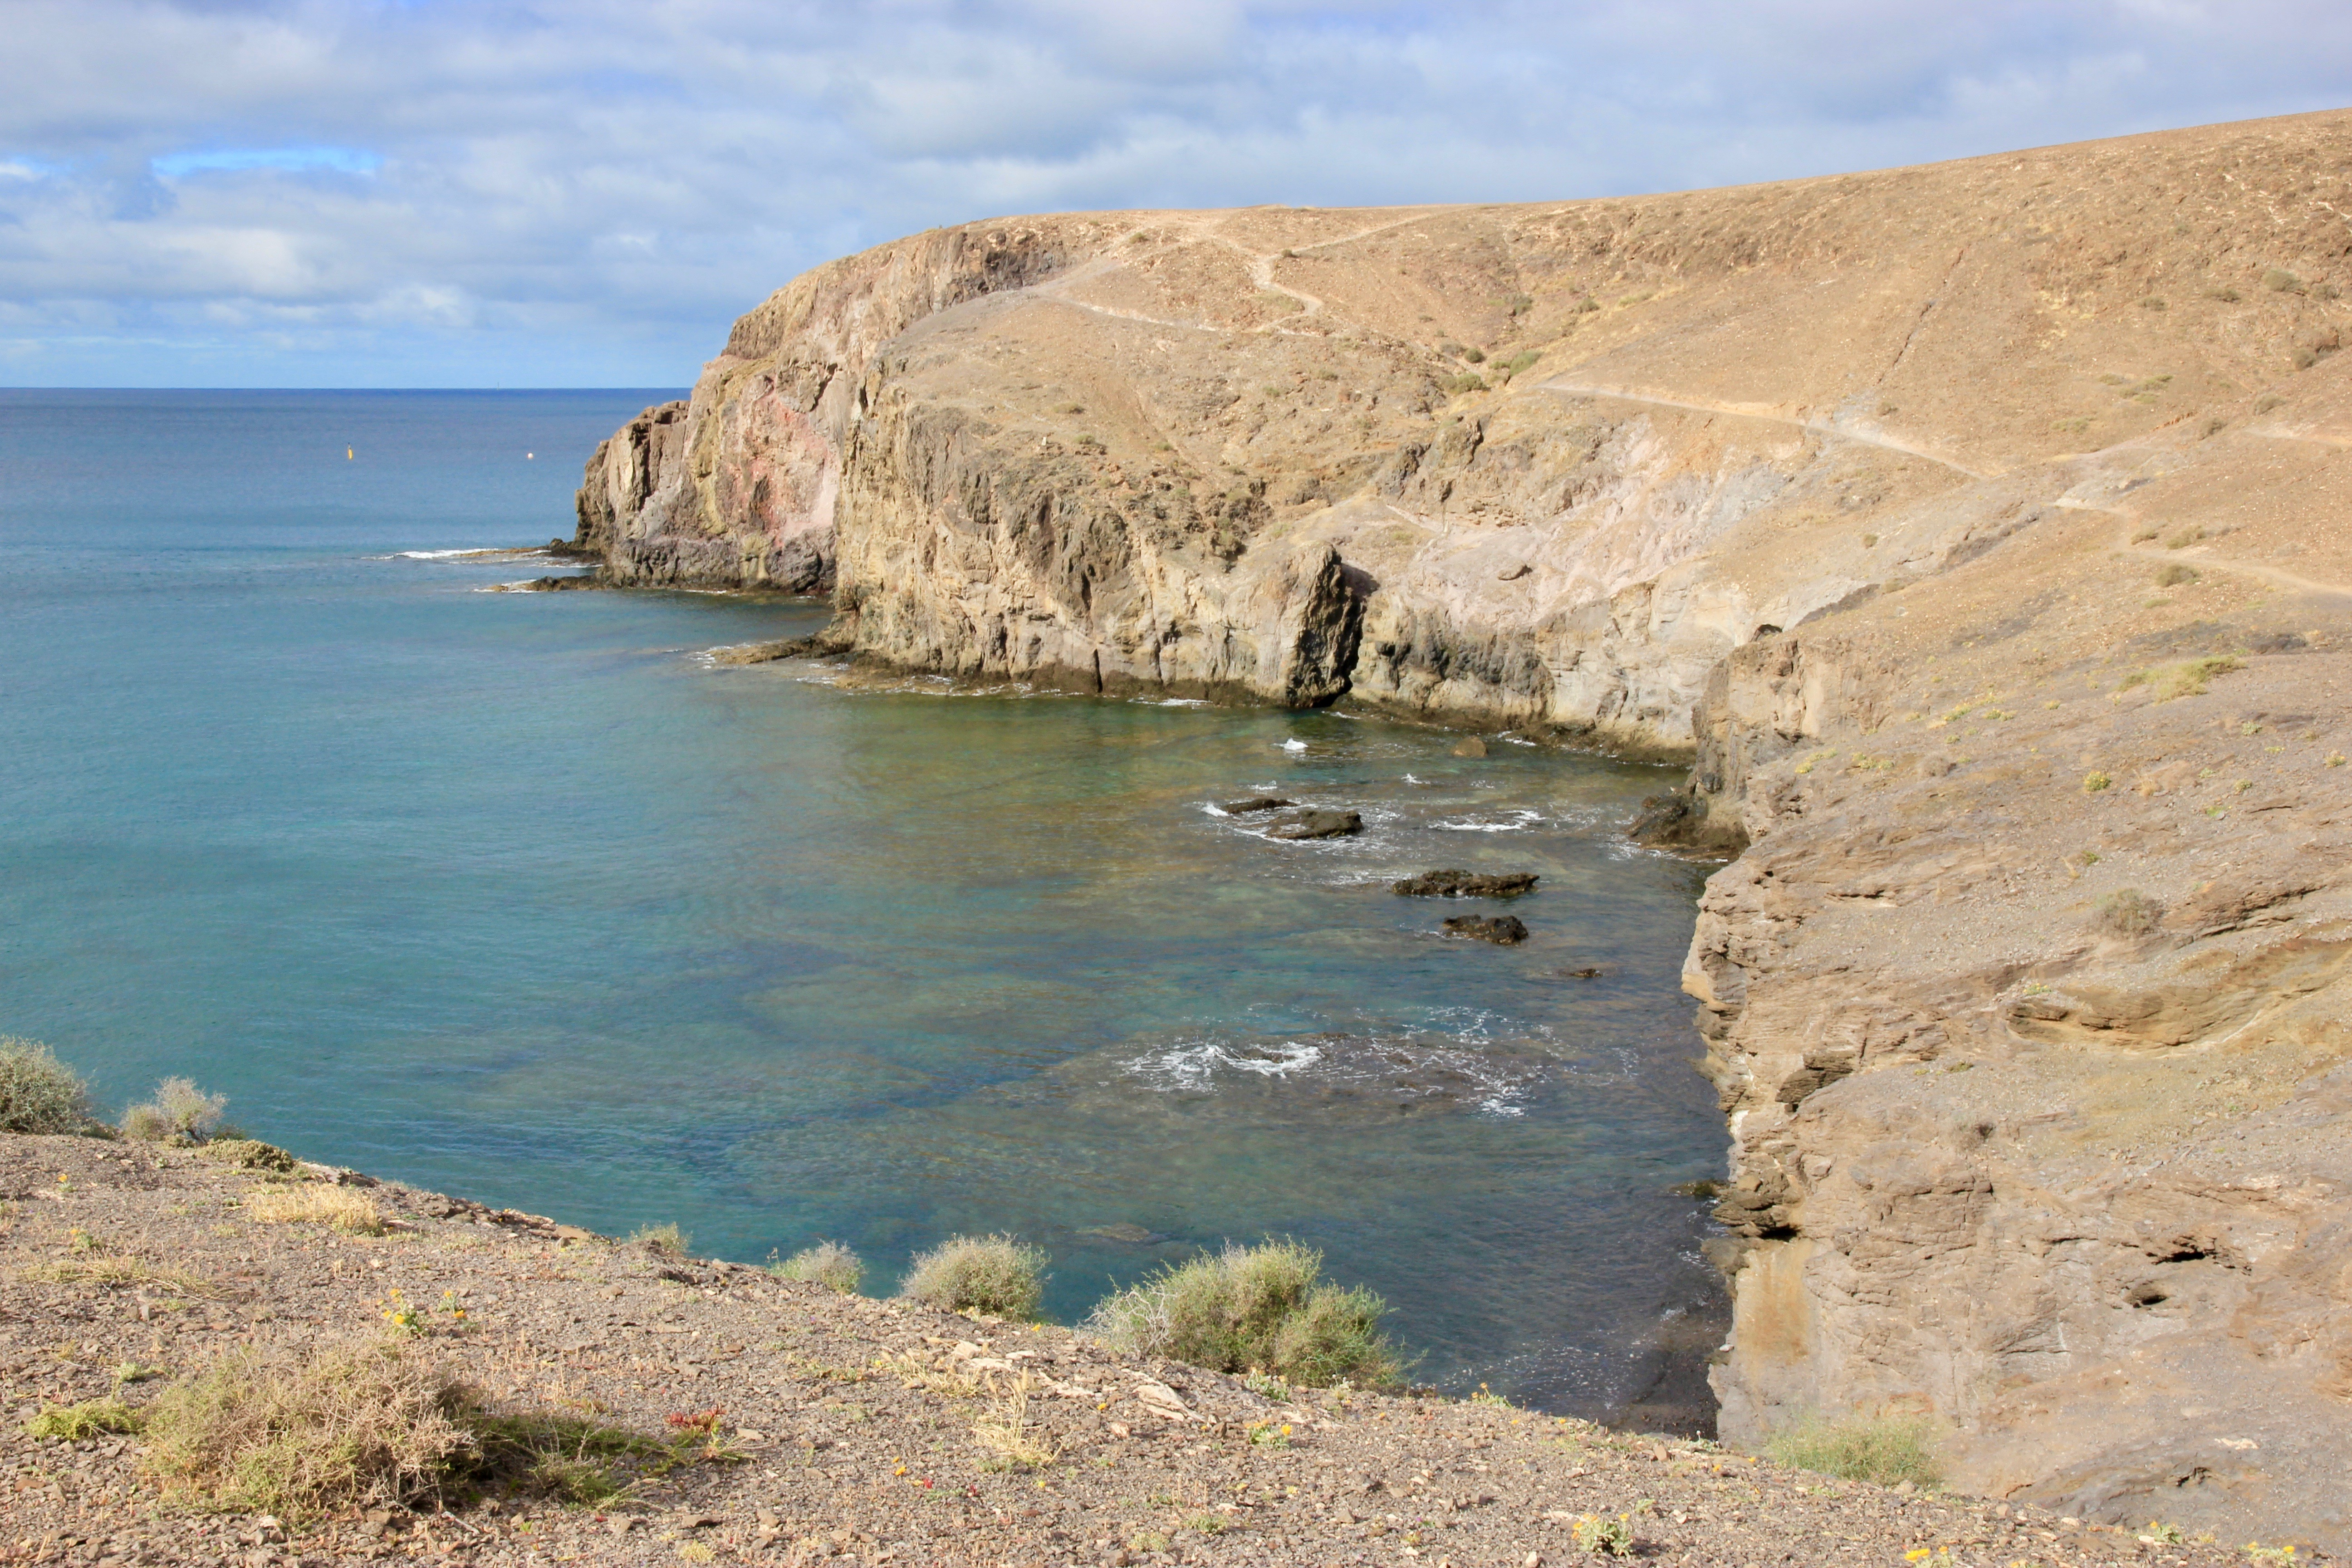 Spiaggia Lanzarote